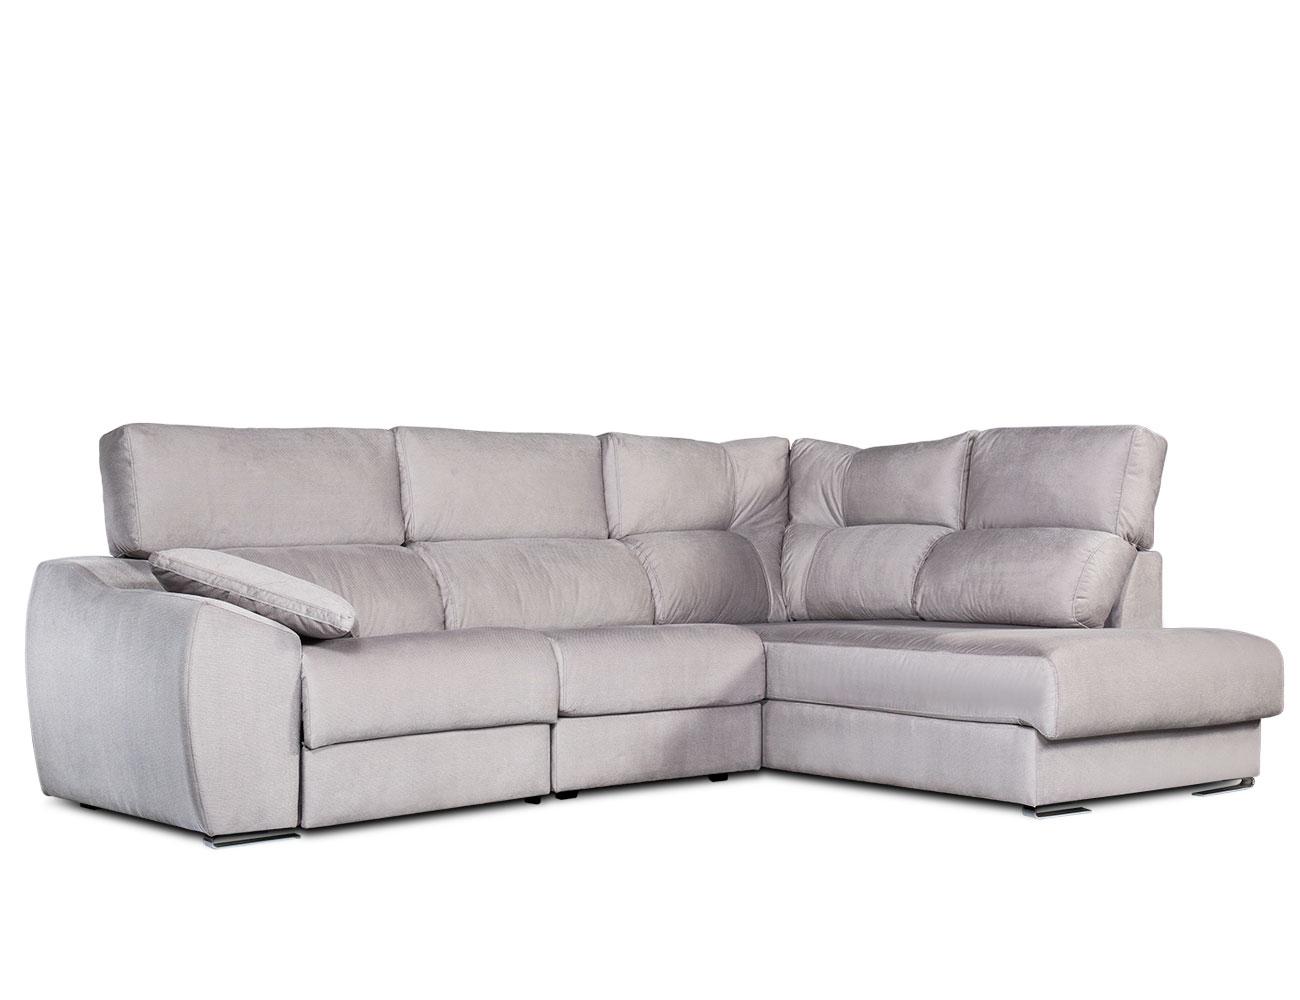 Sofa chaiselongue rincon electrico2